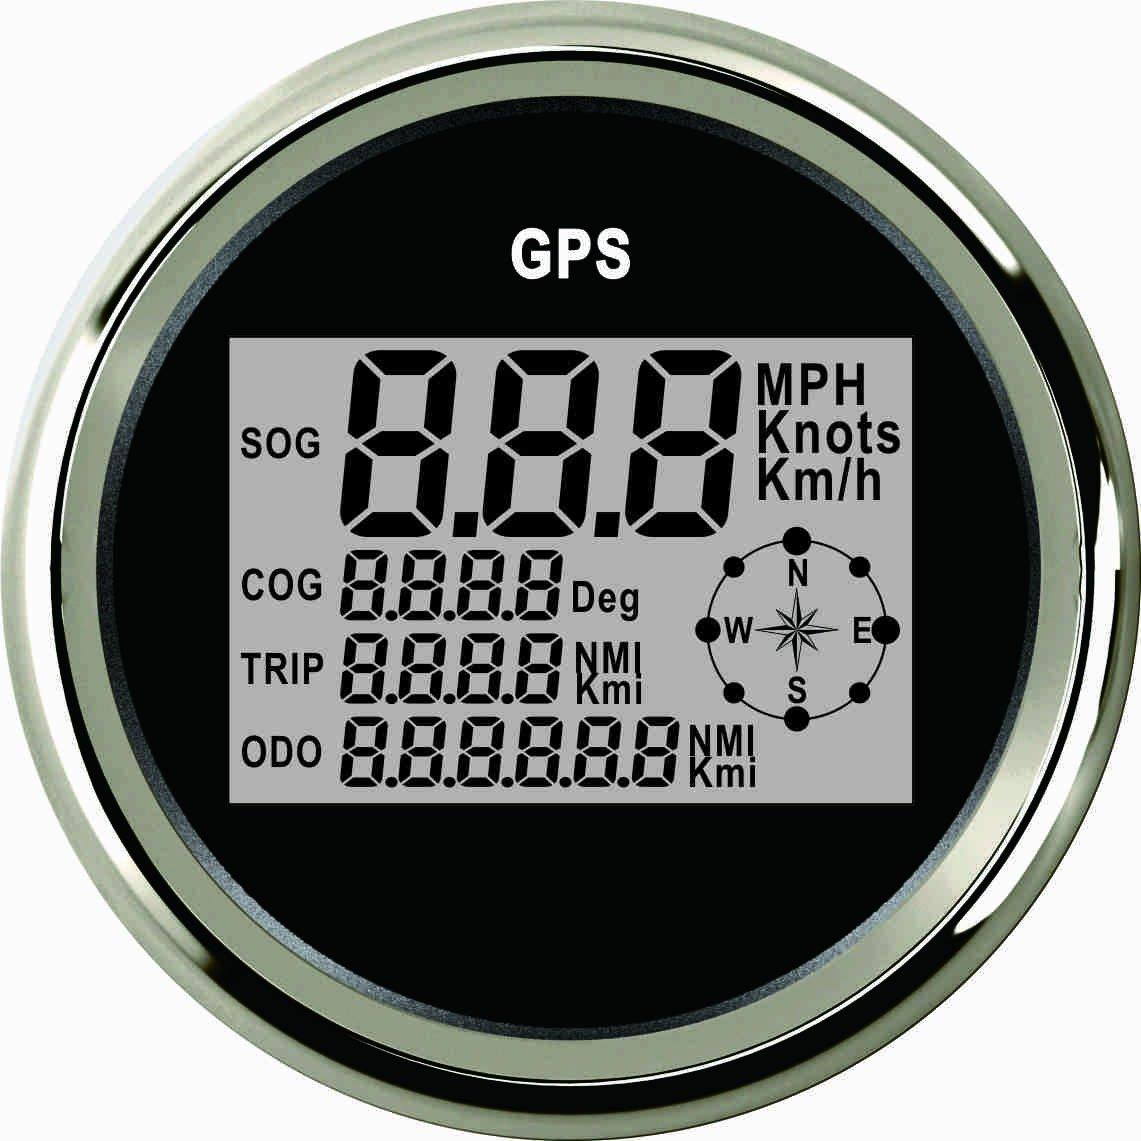 Digital GPS velocí metro Speedo calibre para coche motocicleta camió n yate barco 3 –  3/8 '(85 mm) 9 –  32 V ELING